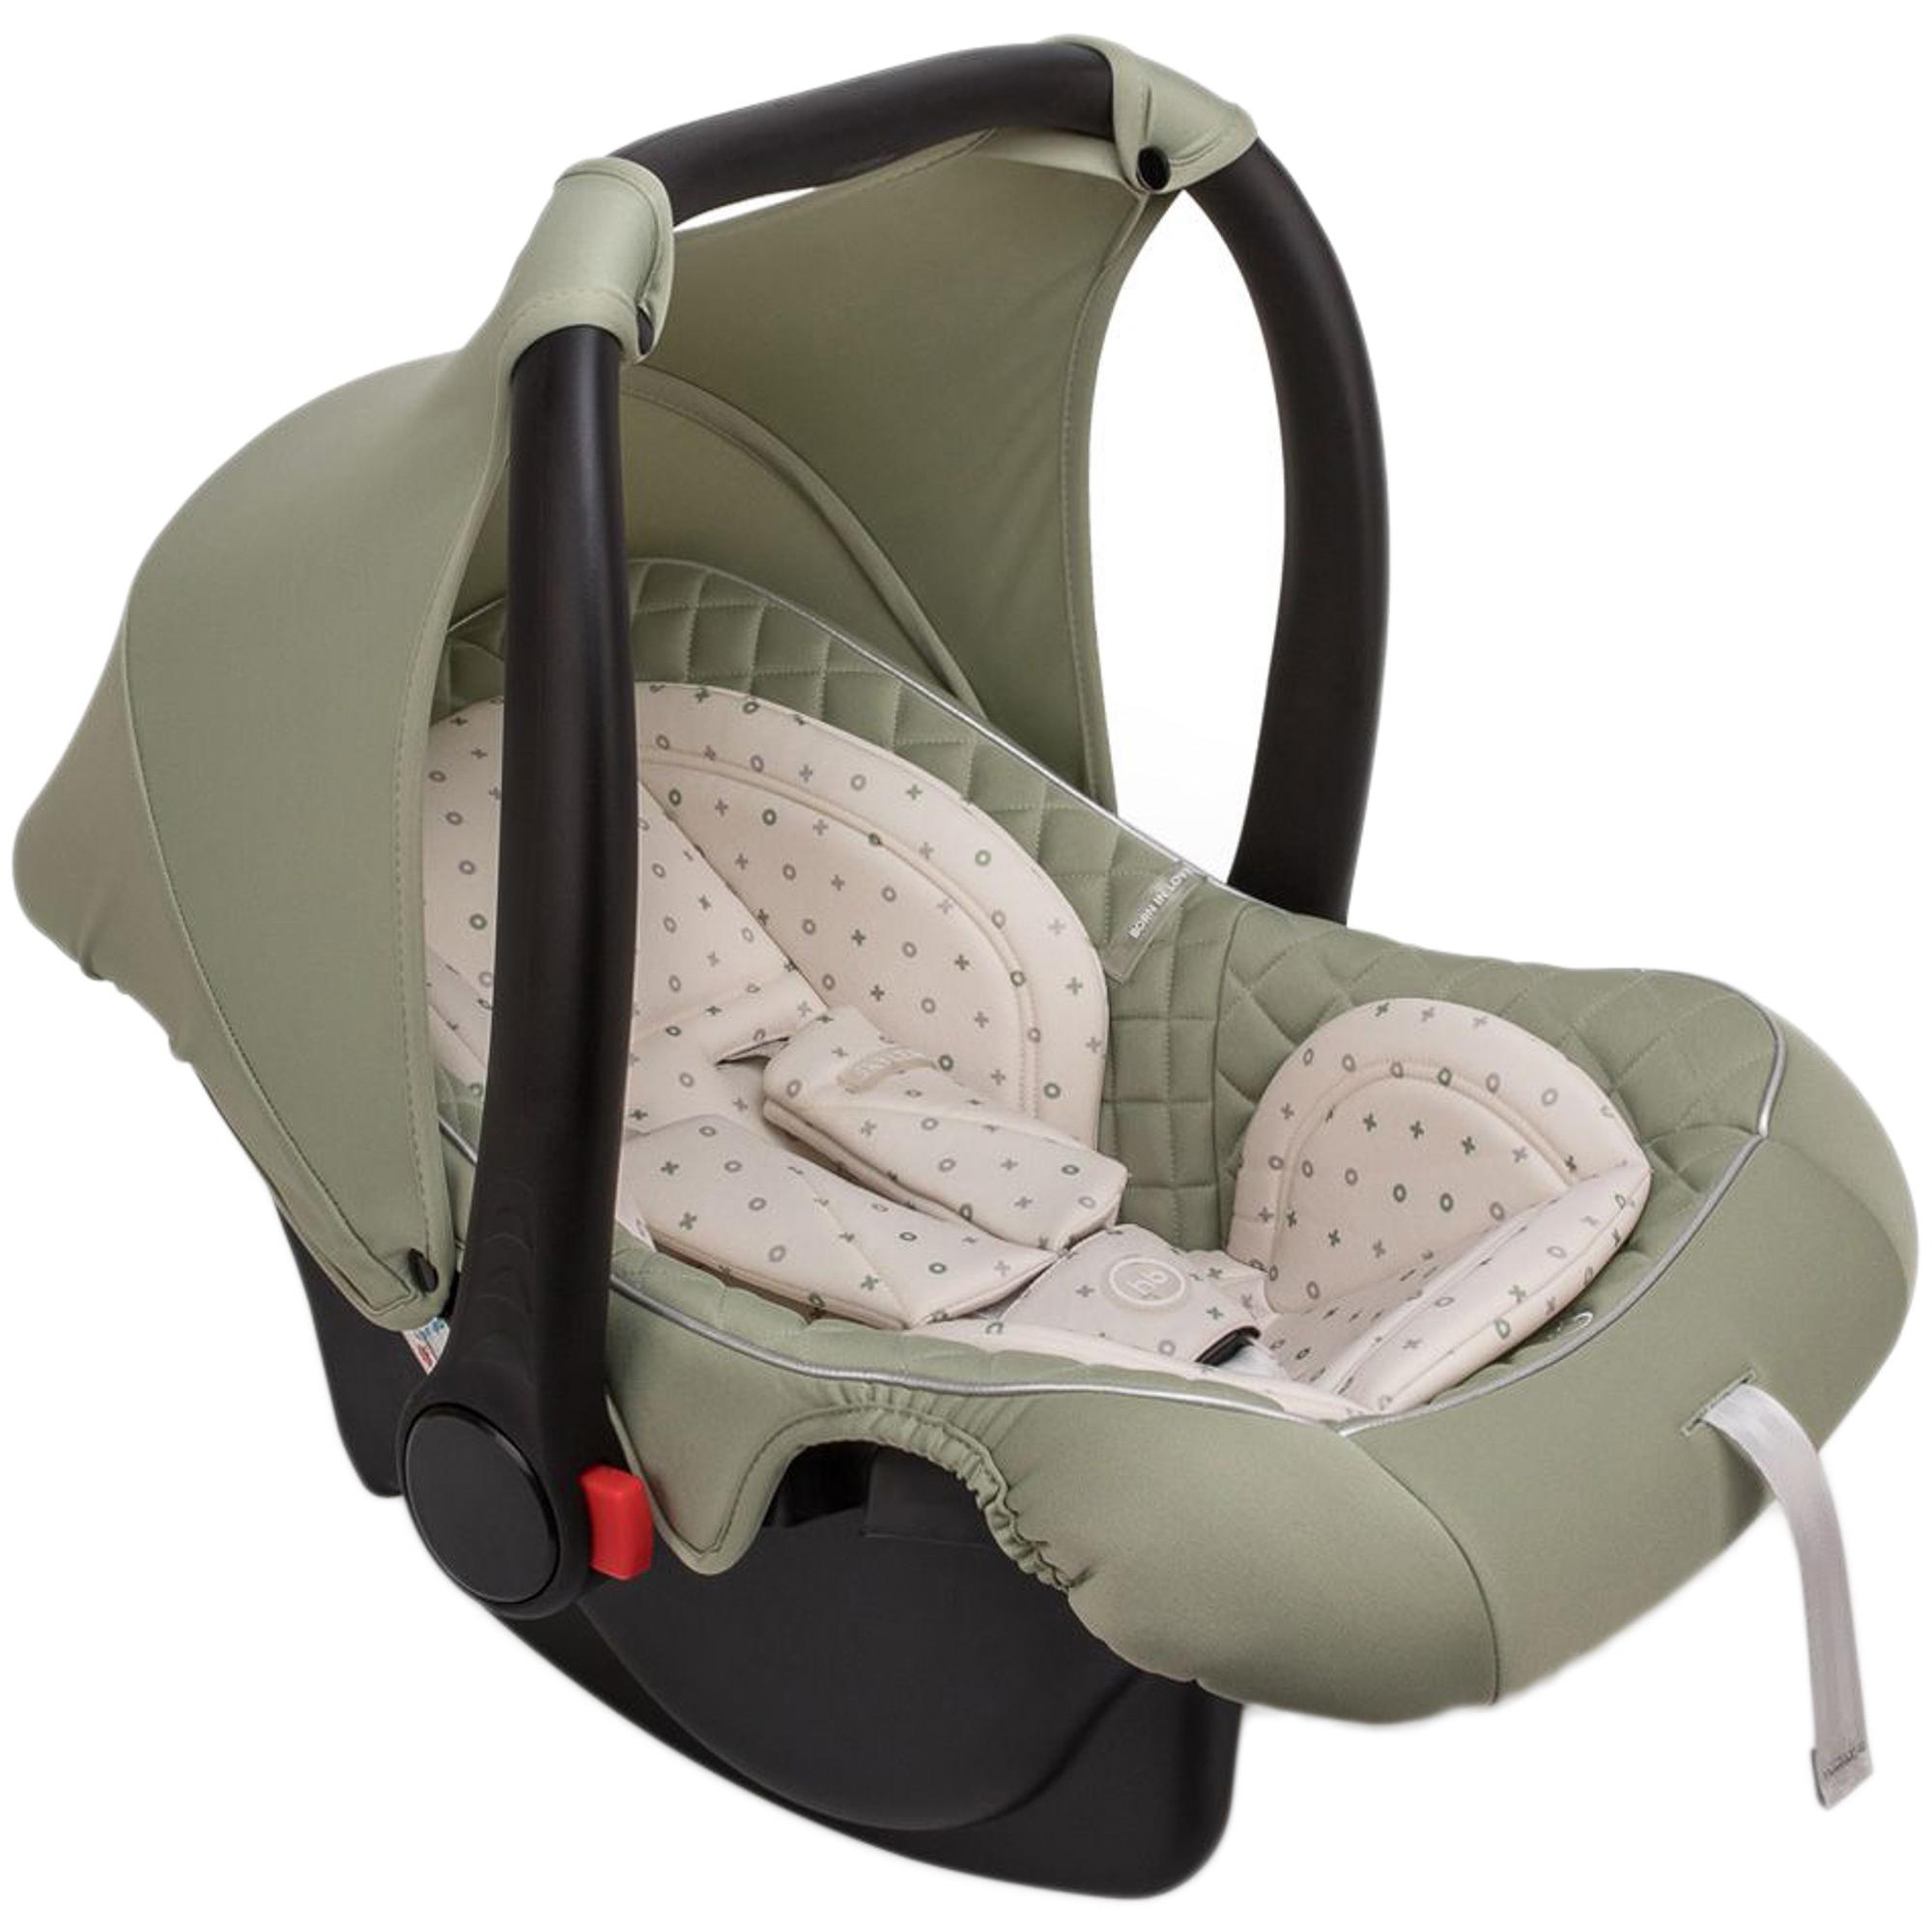 Фото - Автокресло-переноска Happy Baby Skyler V2 Green автокресло happy baby passenger v2 graphite черный